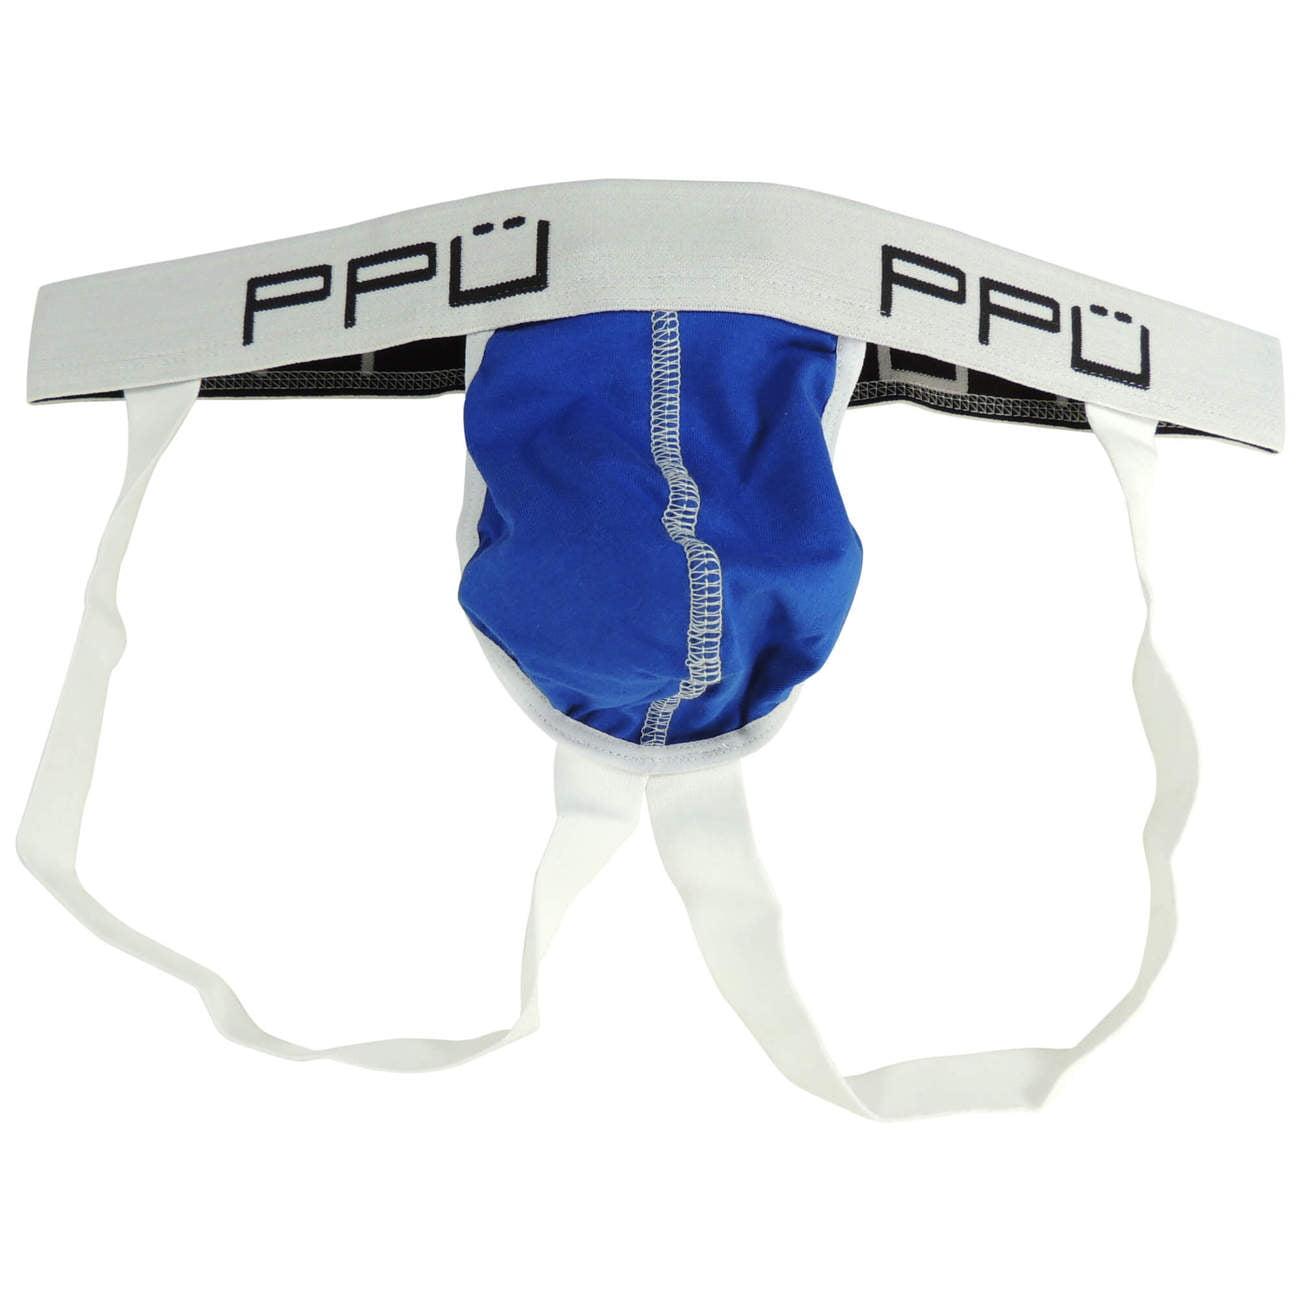 PPU 1302 Jock Thong